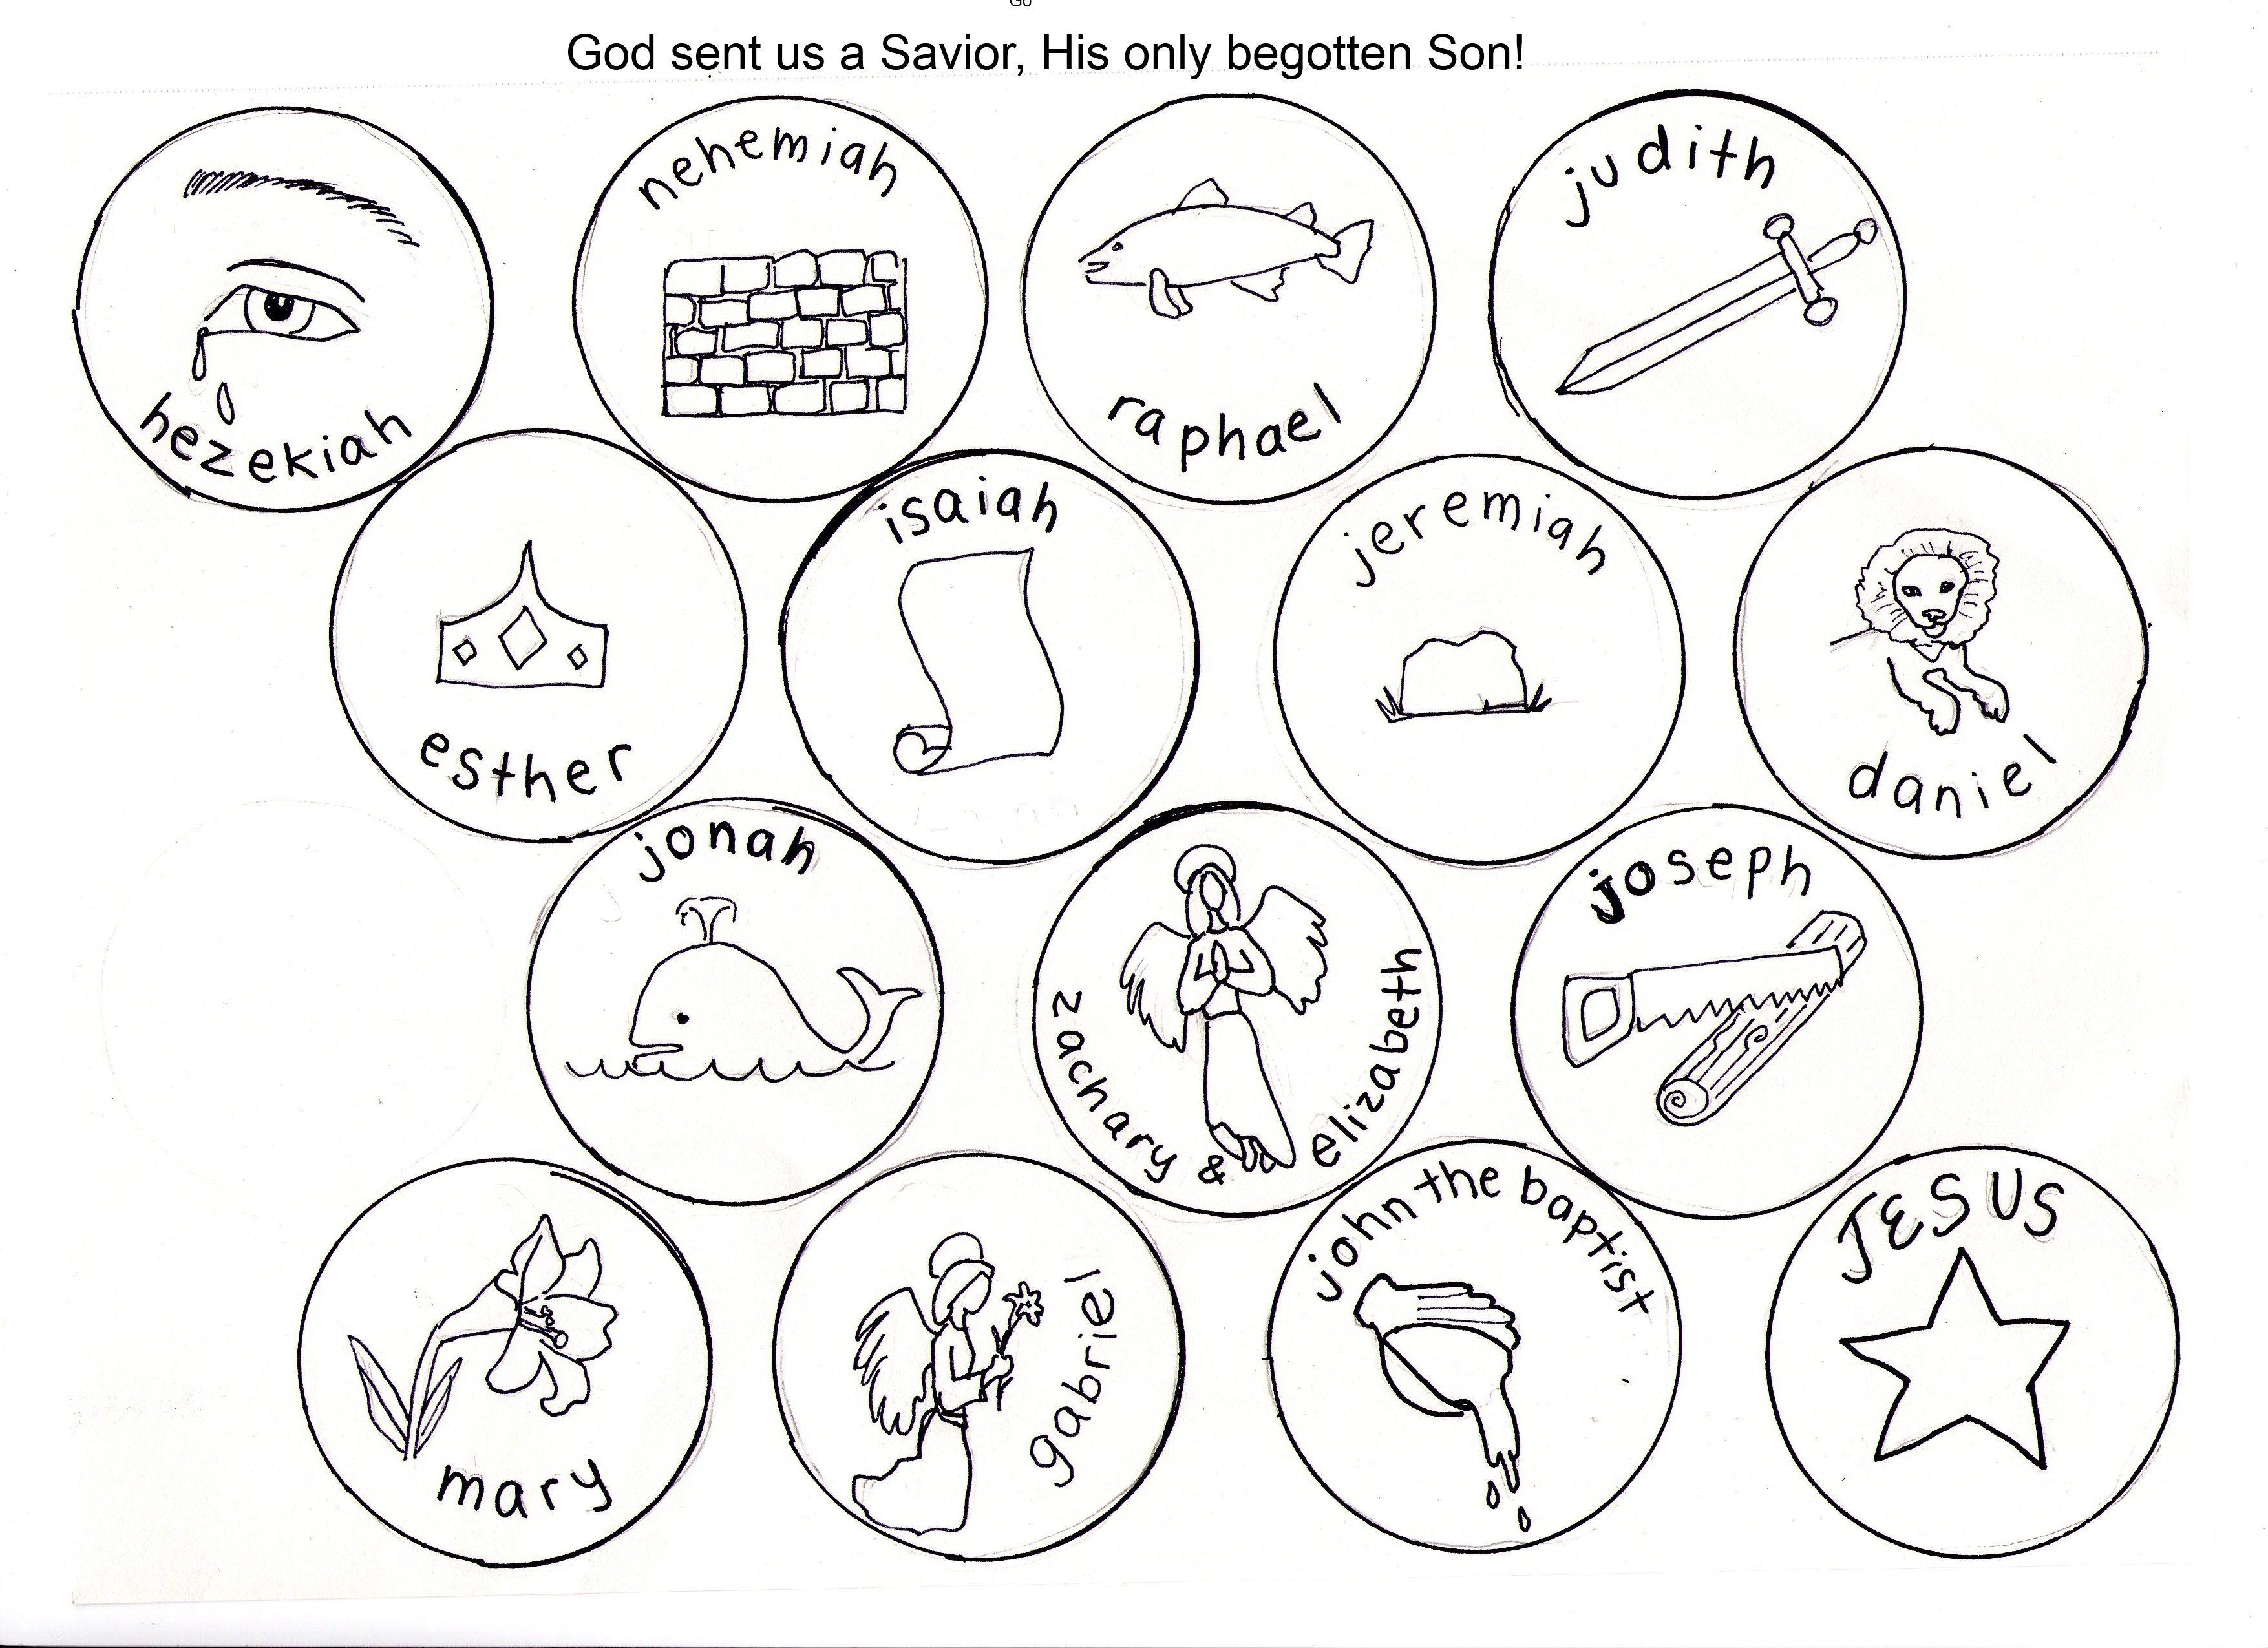 jesse tree symbols coloring pages - photo#2